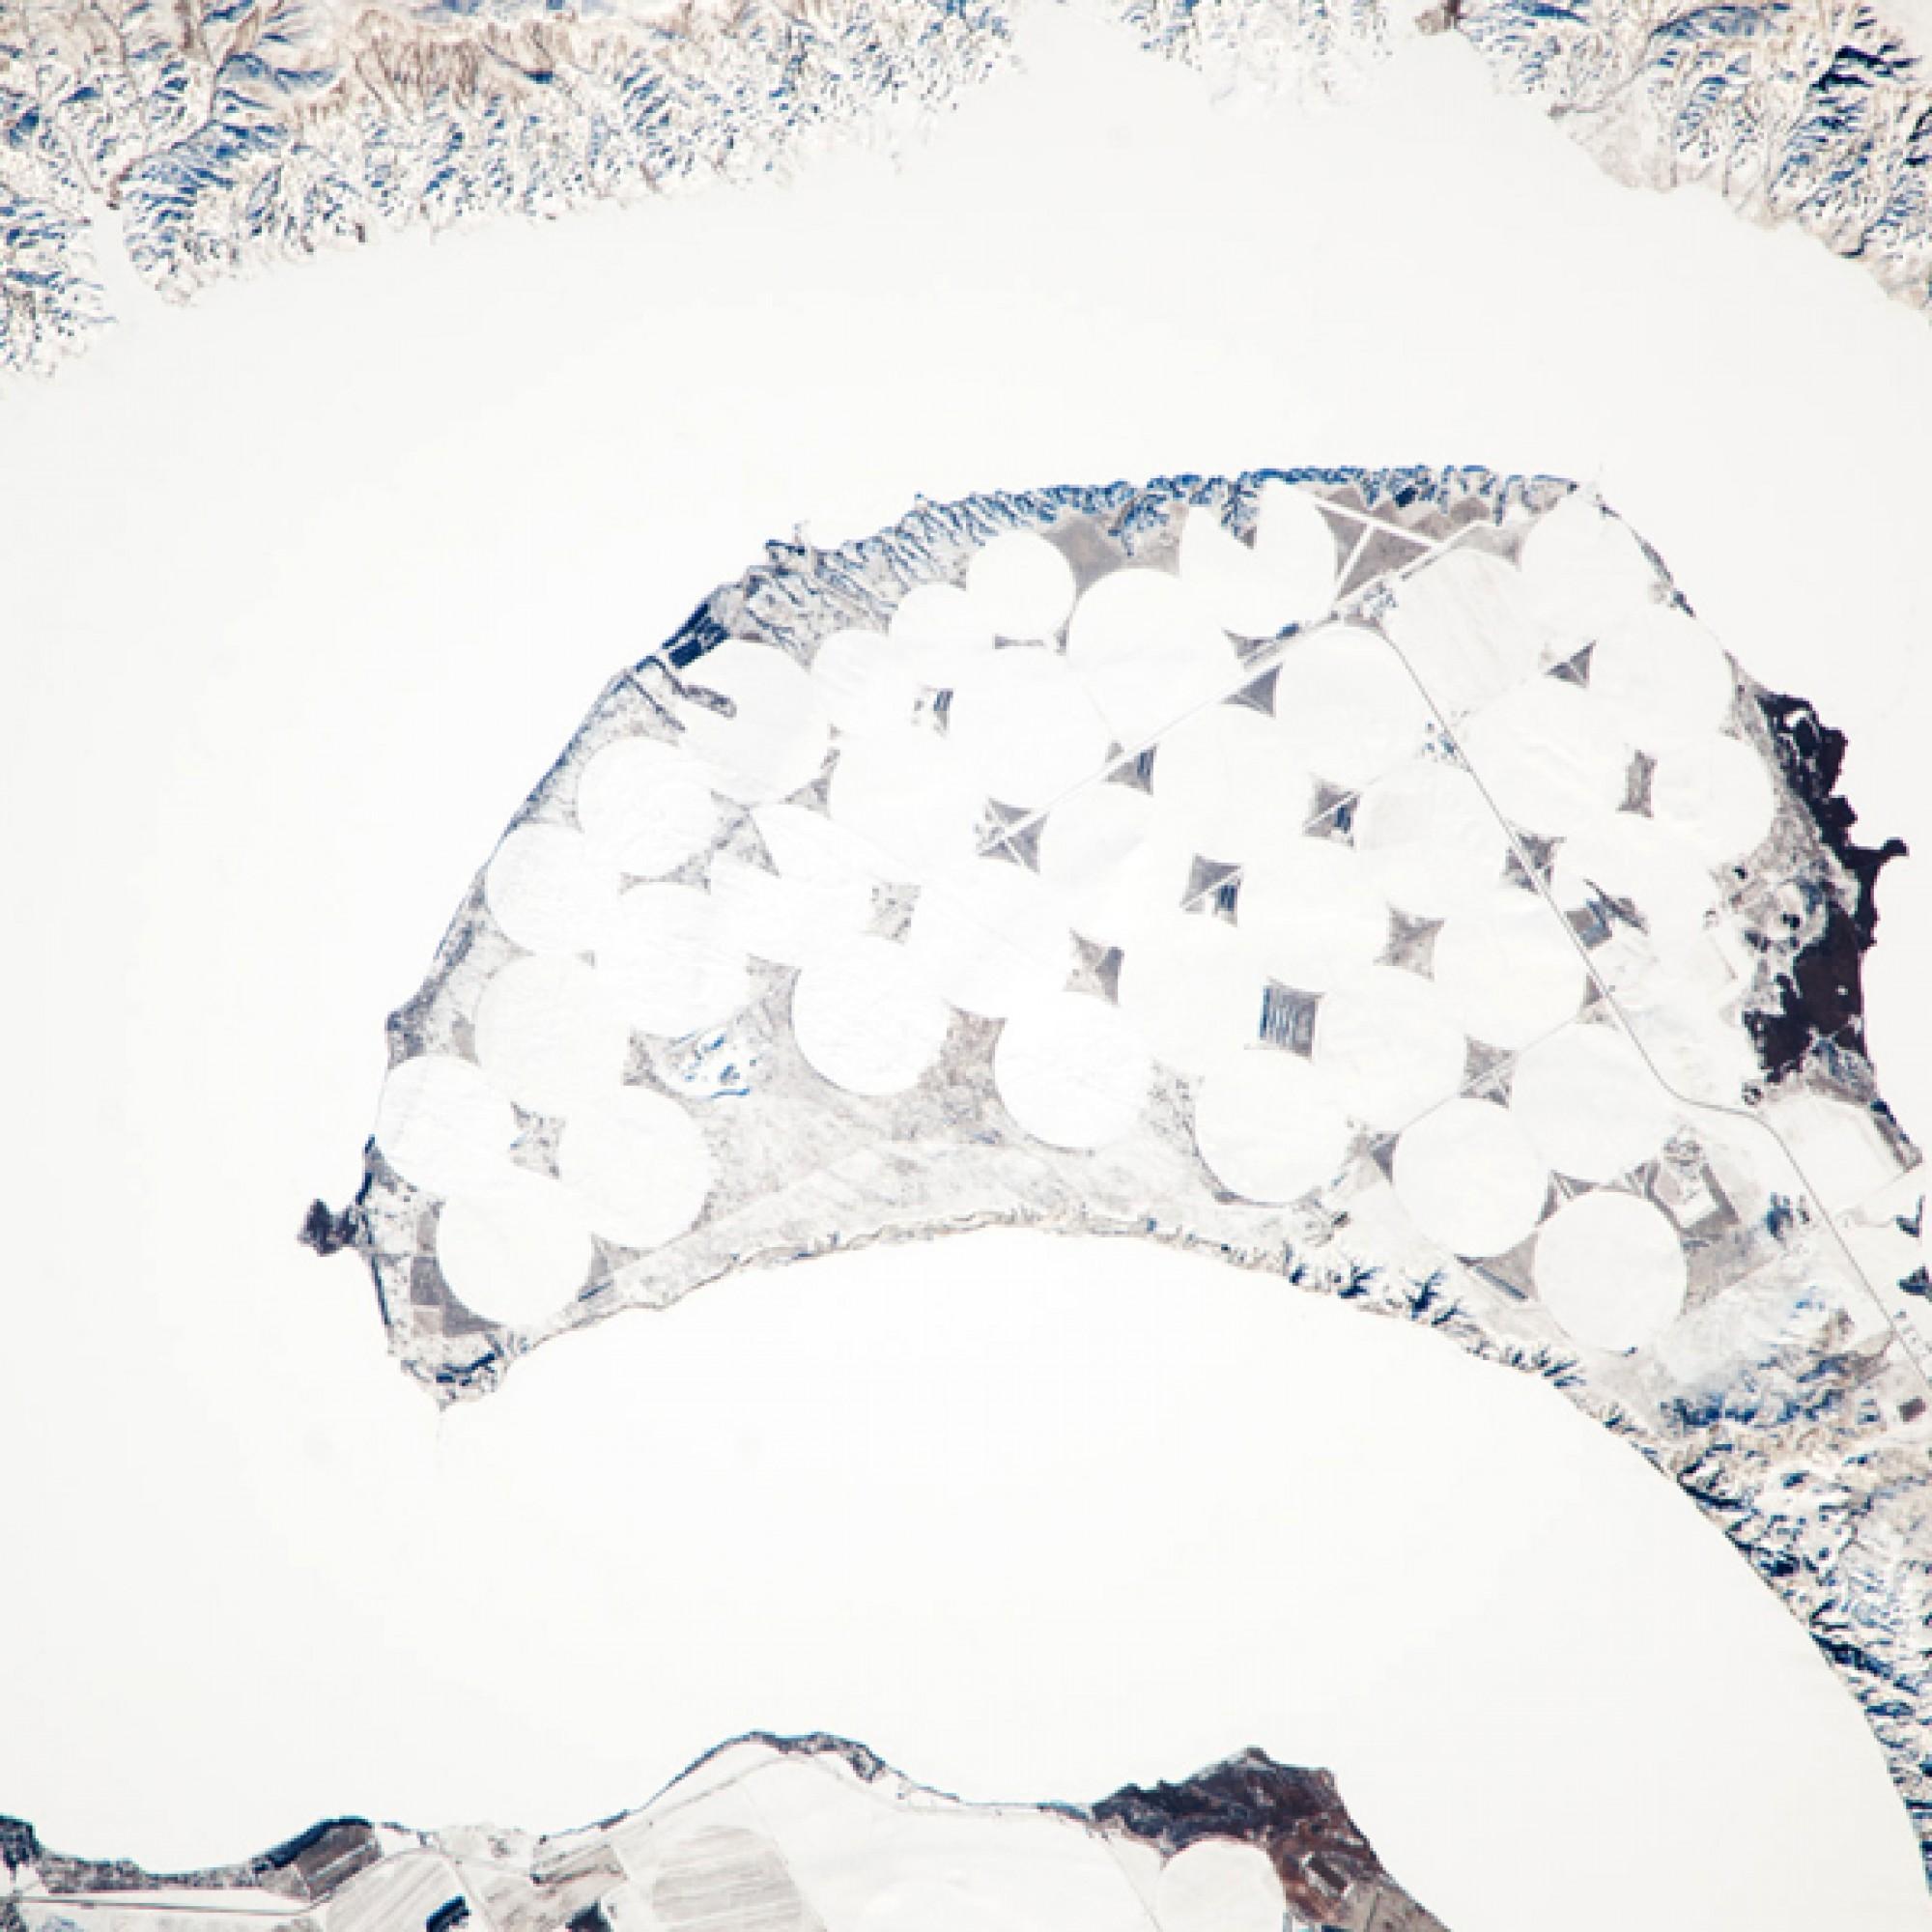 Gefrorener Lake Sharp in South Dakota (USA). (Nasa)